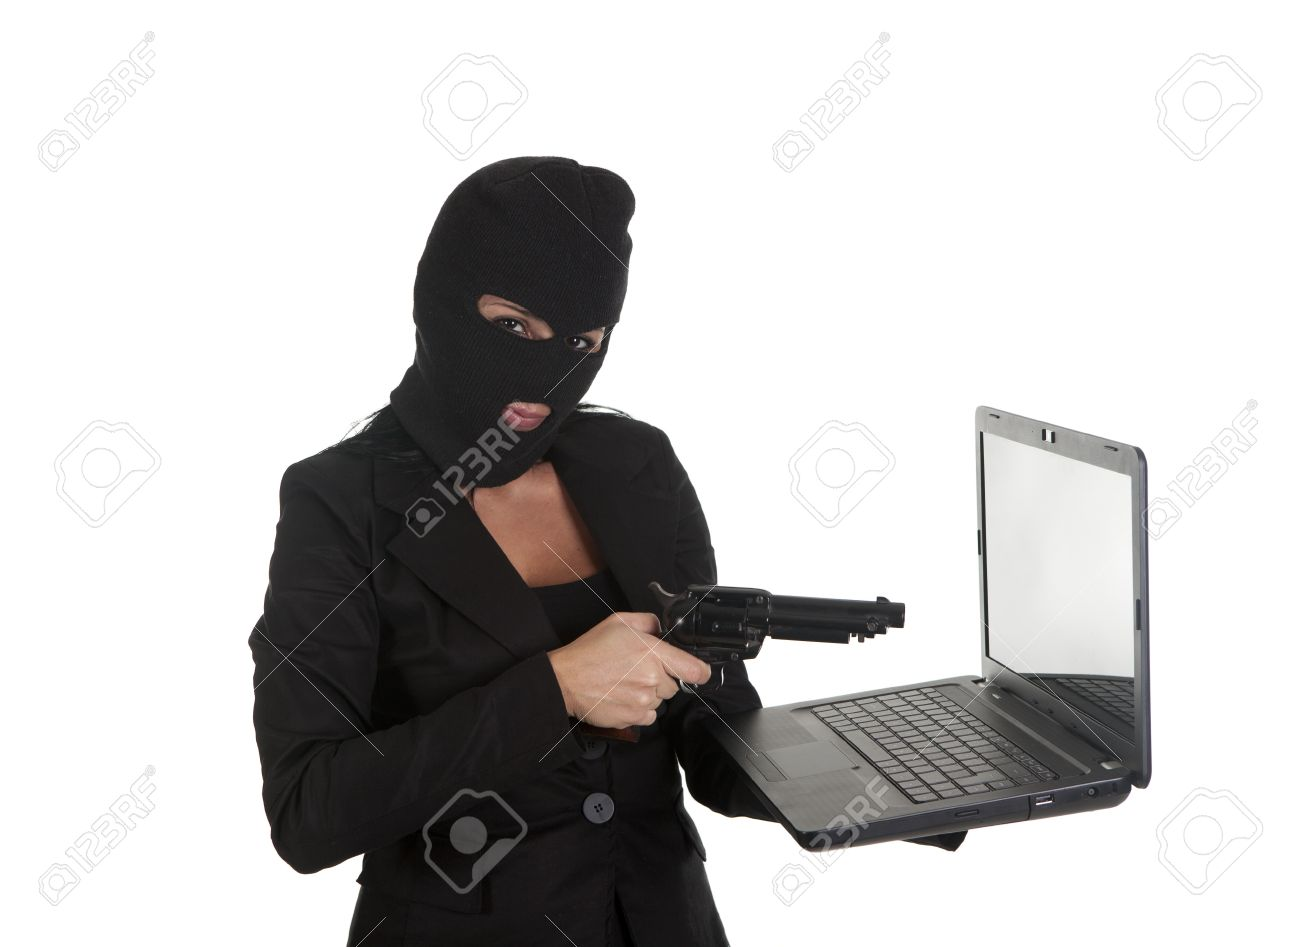 a hacker, committing a crime  through laptop Stock Photo - 16407713